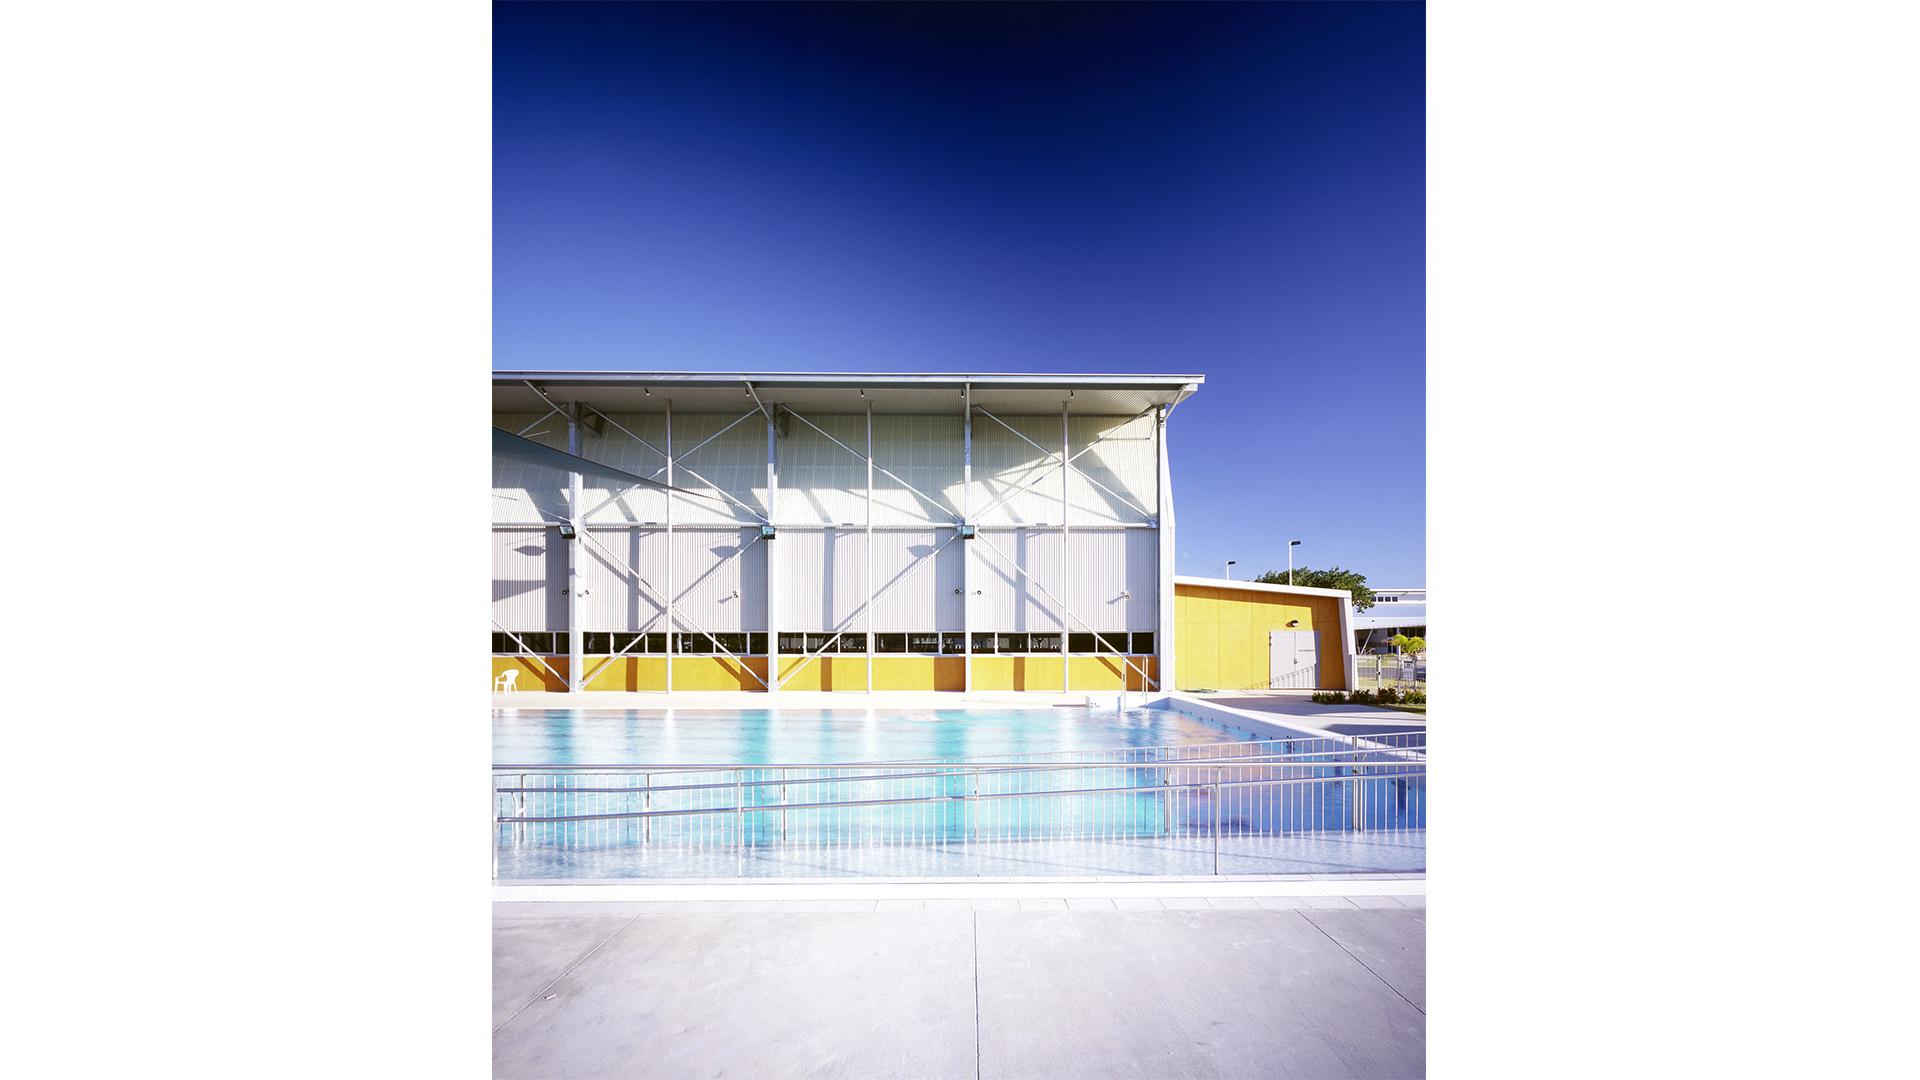 RAAF Townsville